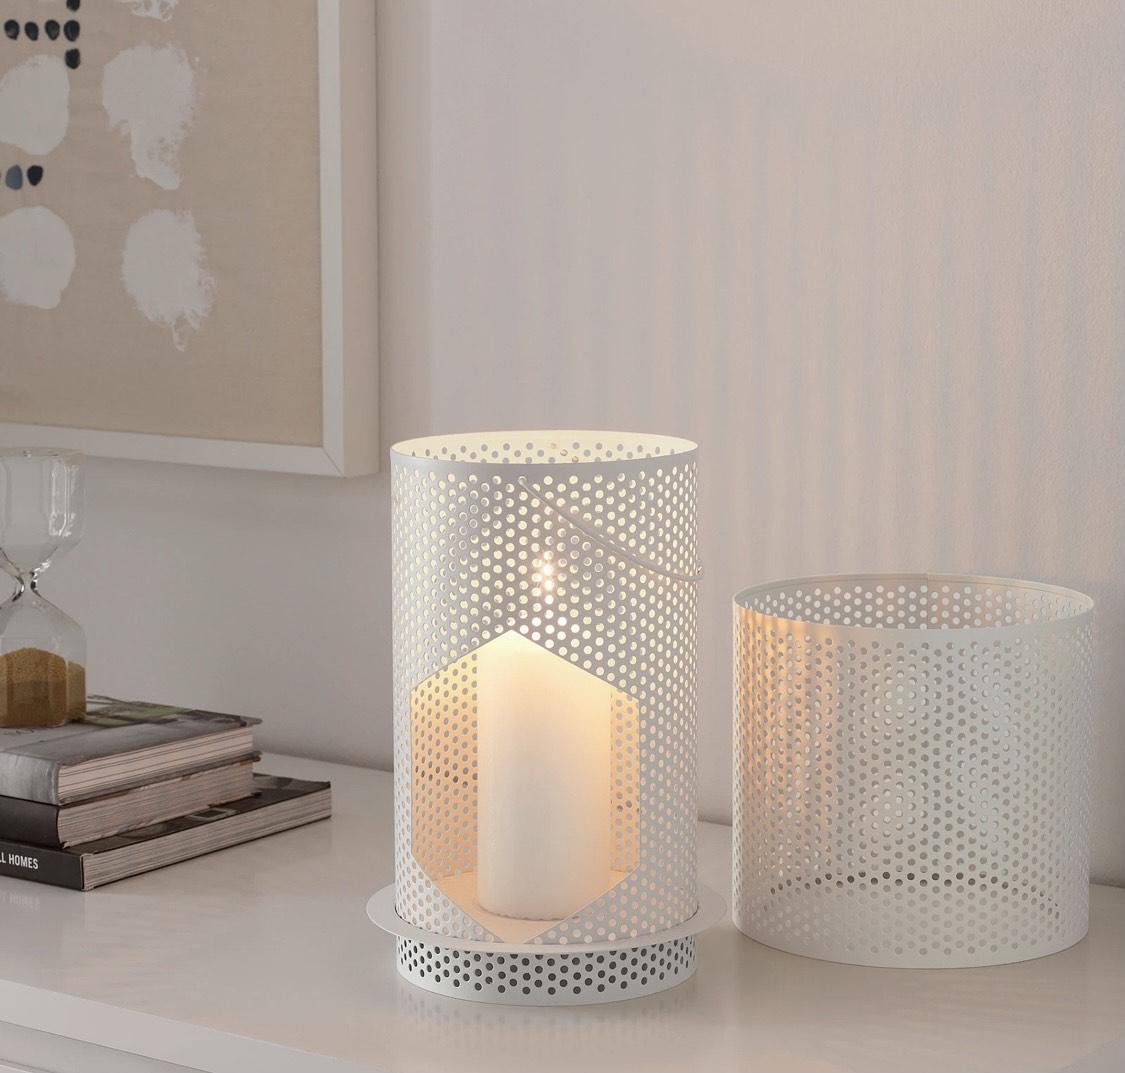 BEHÄRSKA Lantern for block candle, white 26 cm £1 at IKEA Leeds